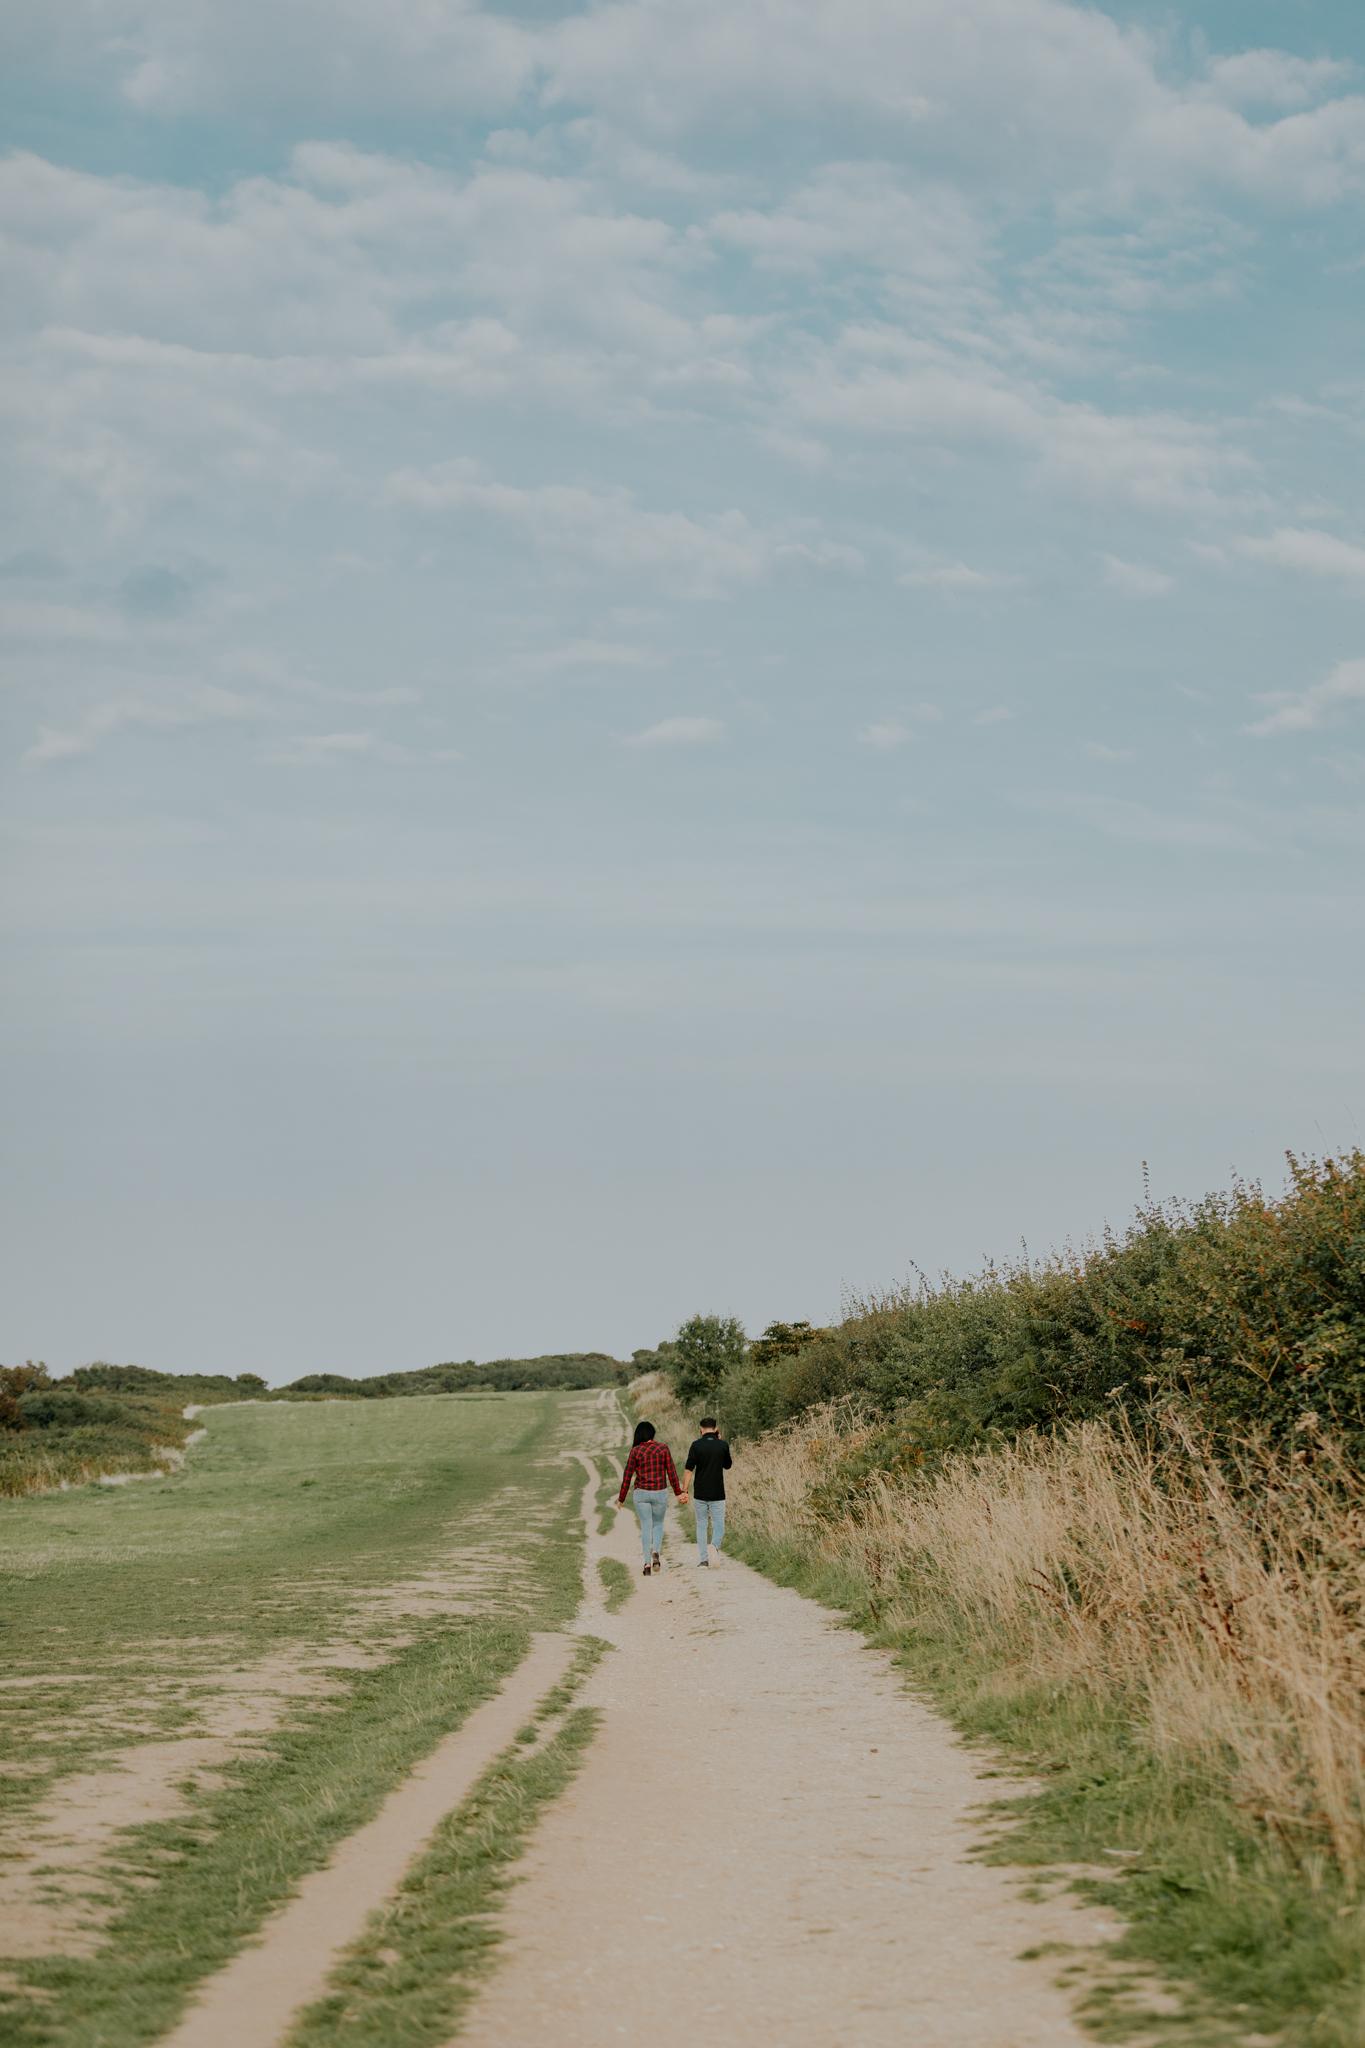 Natalie Skoric - England Travel Photography (116).jpg